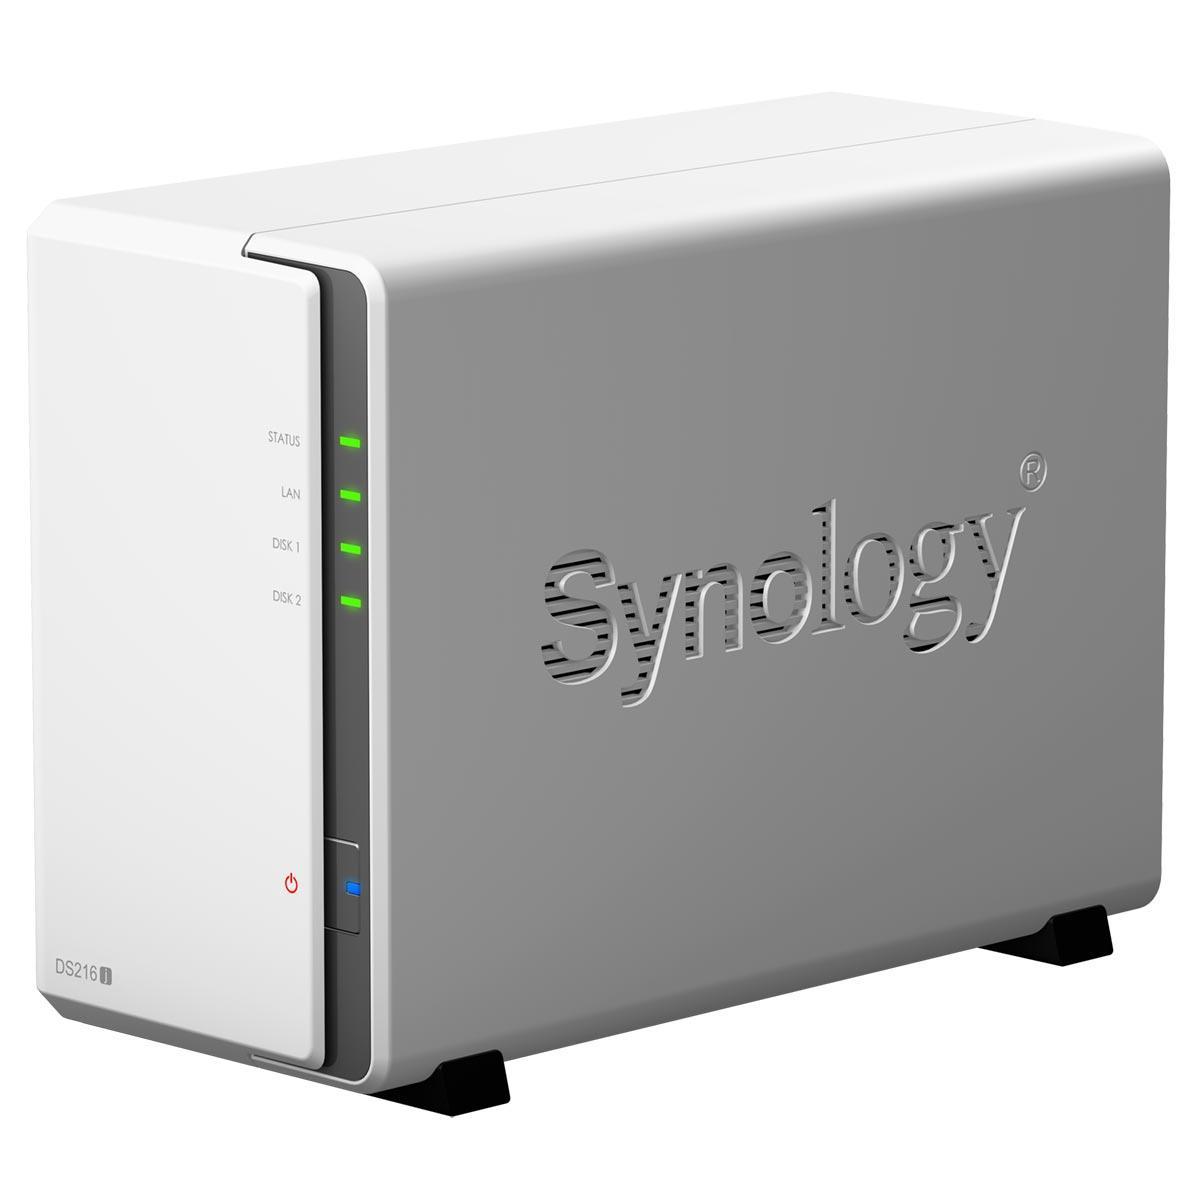 Serveur de stockage NAS Synology DiskStation DS216j - 2 baies